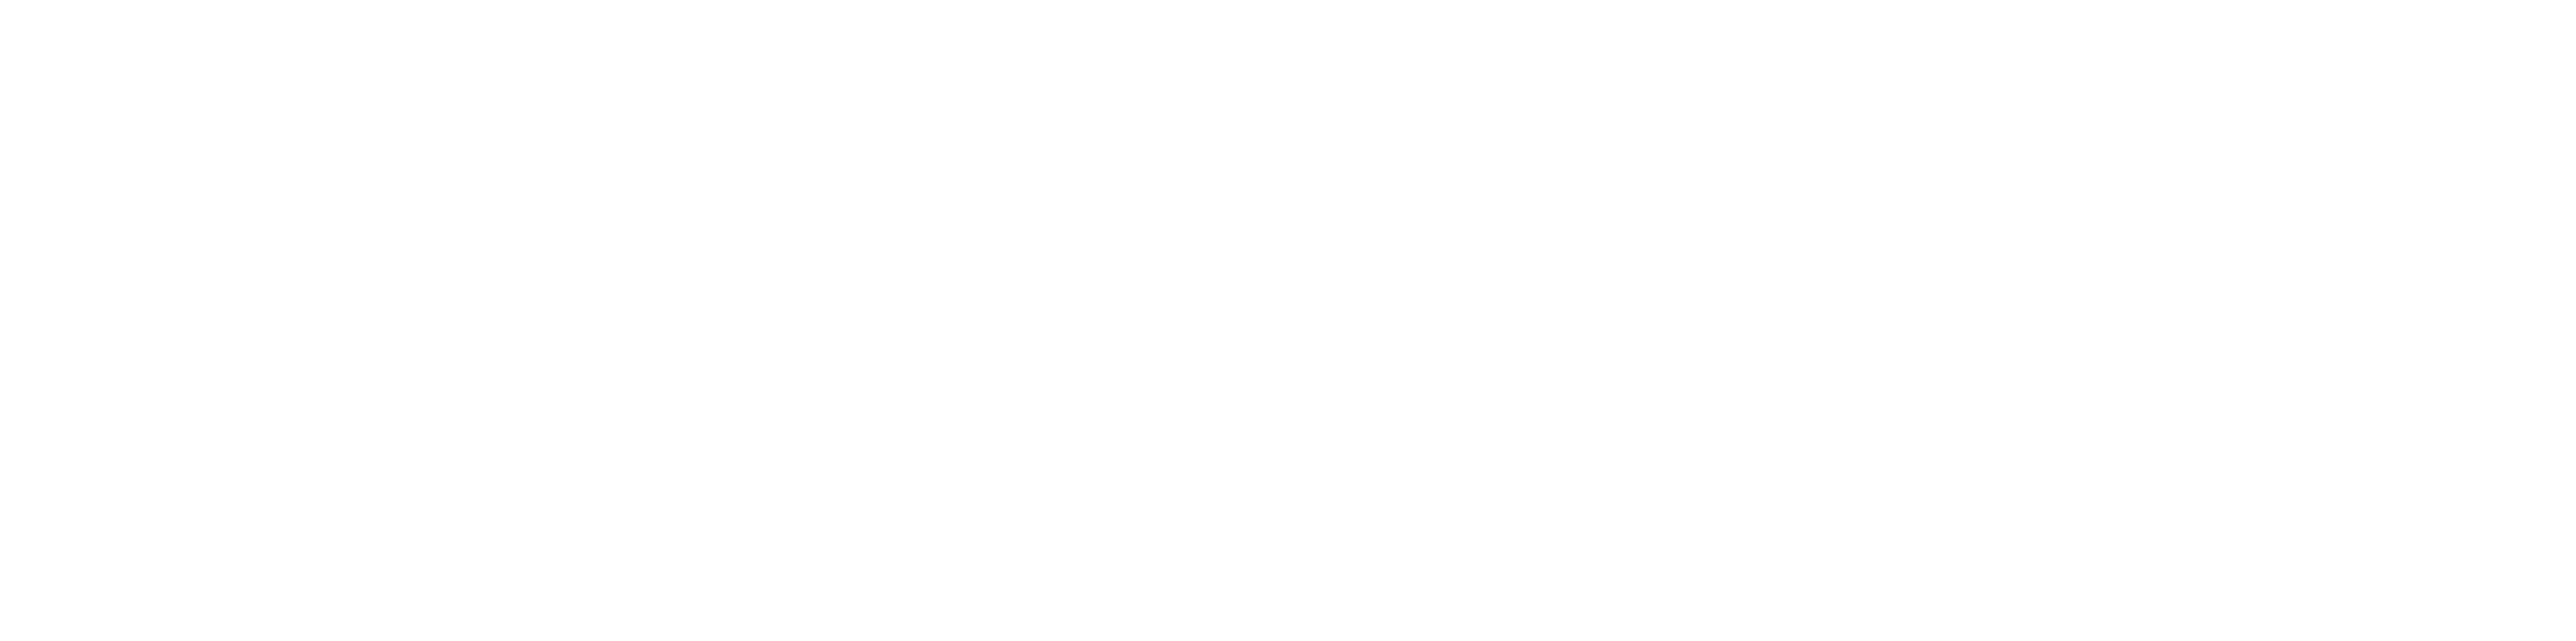 Calpacific Equipment Company